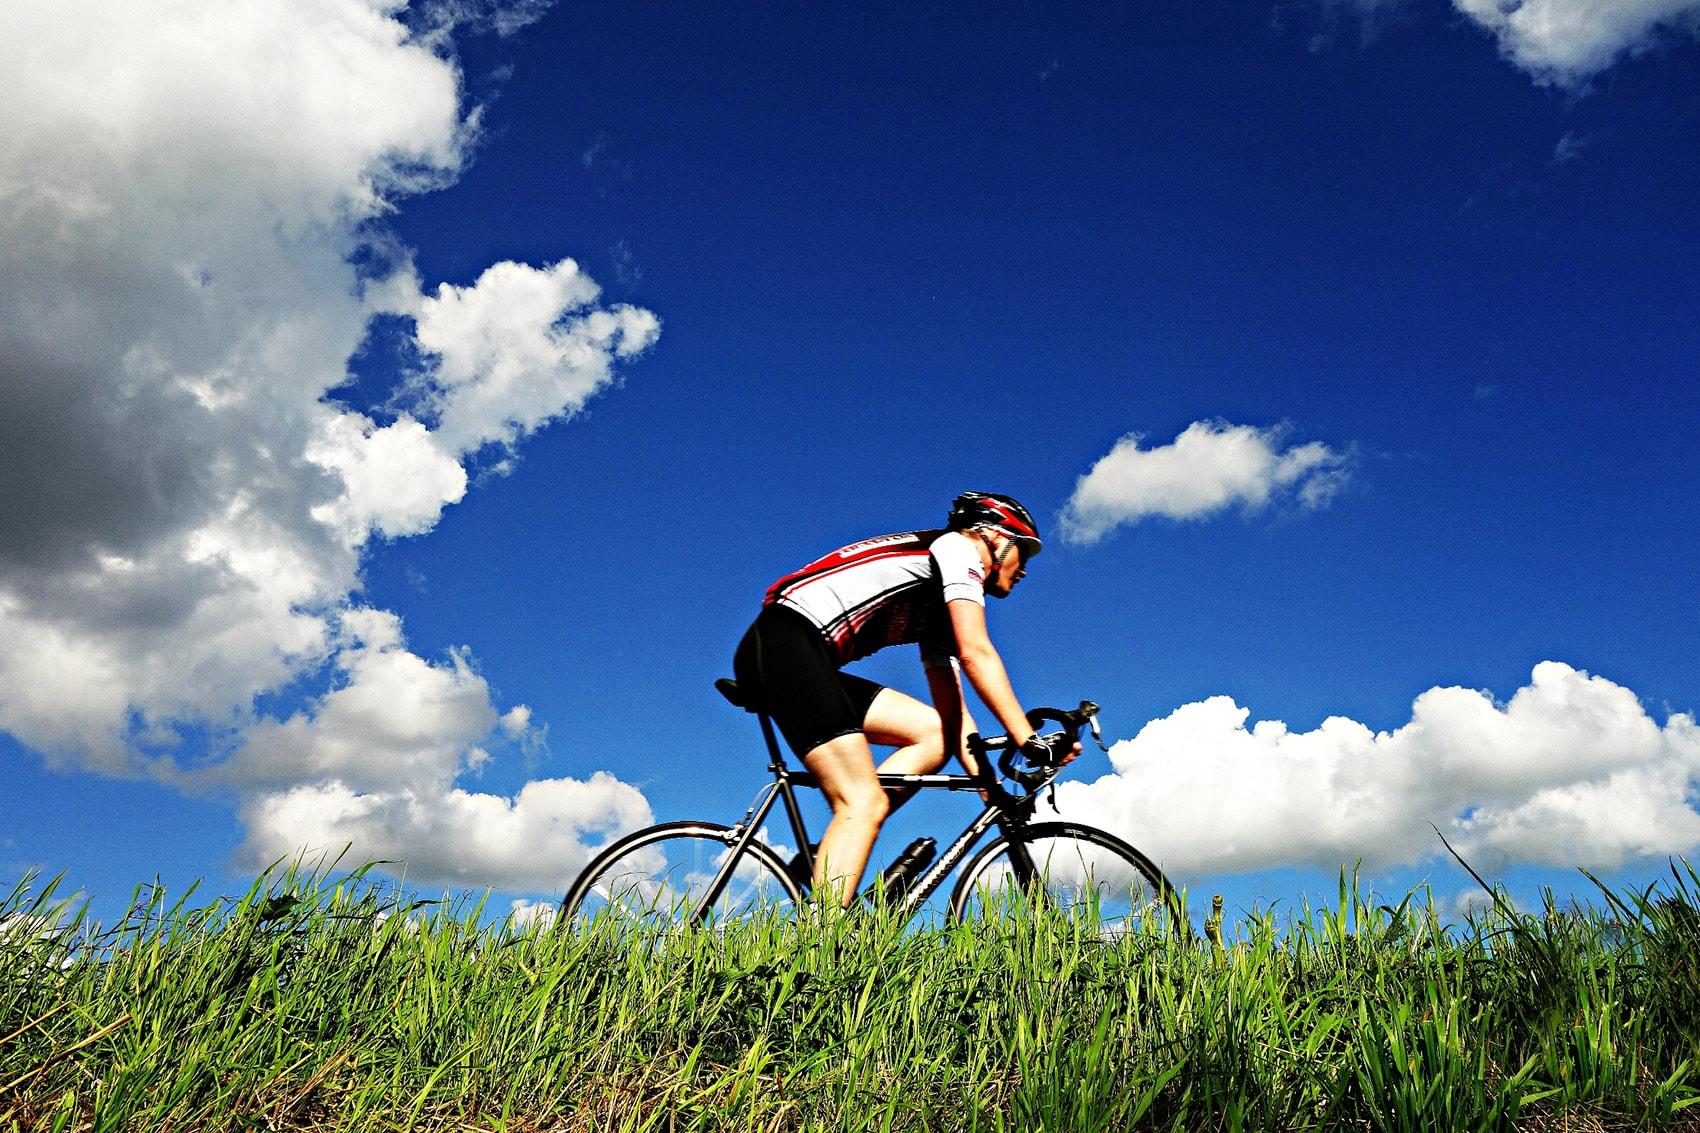 Côte d'Azur's sports stays